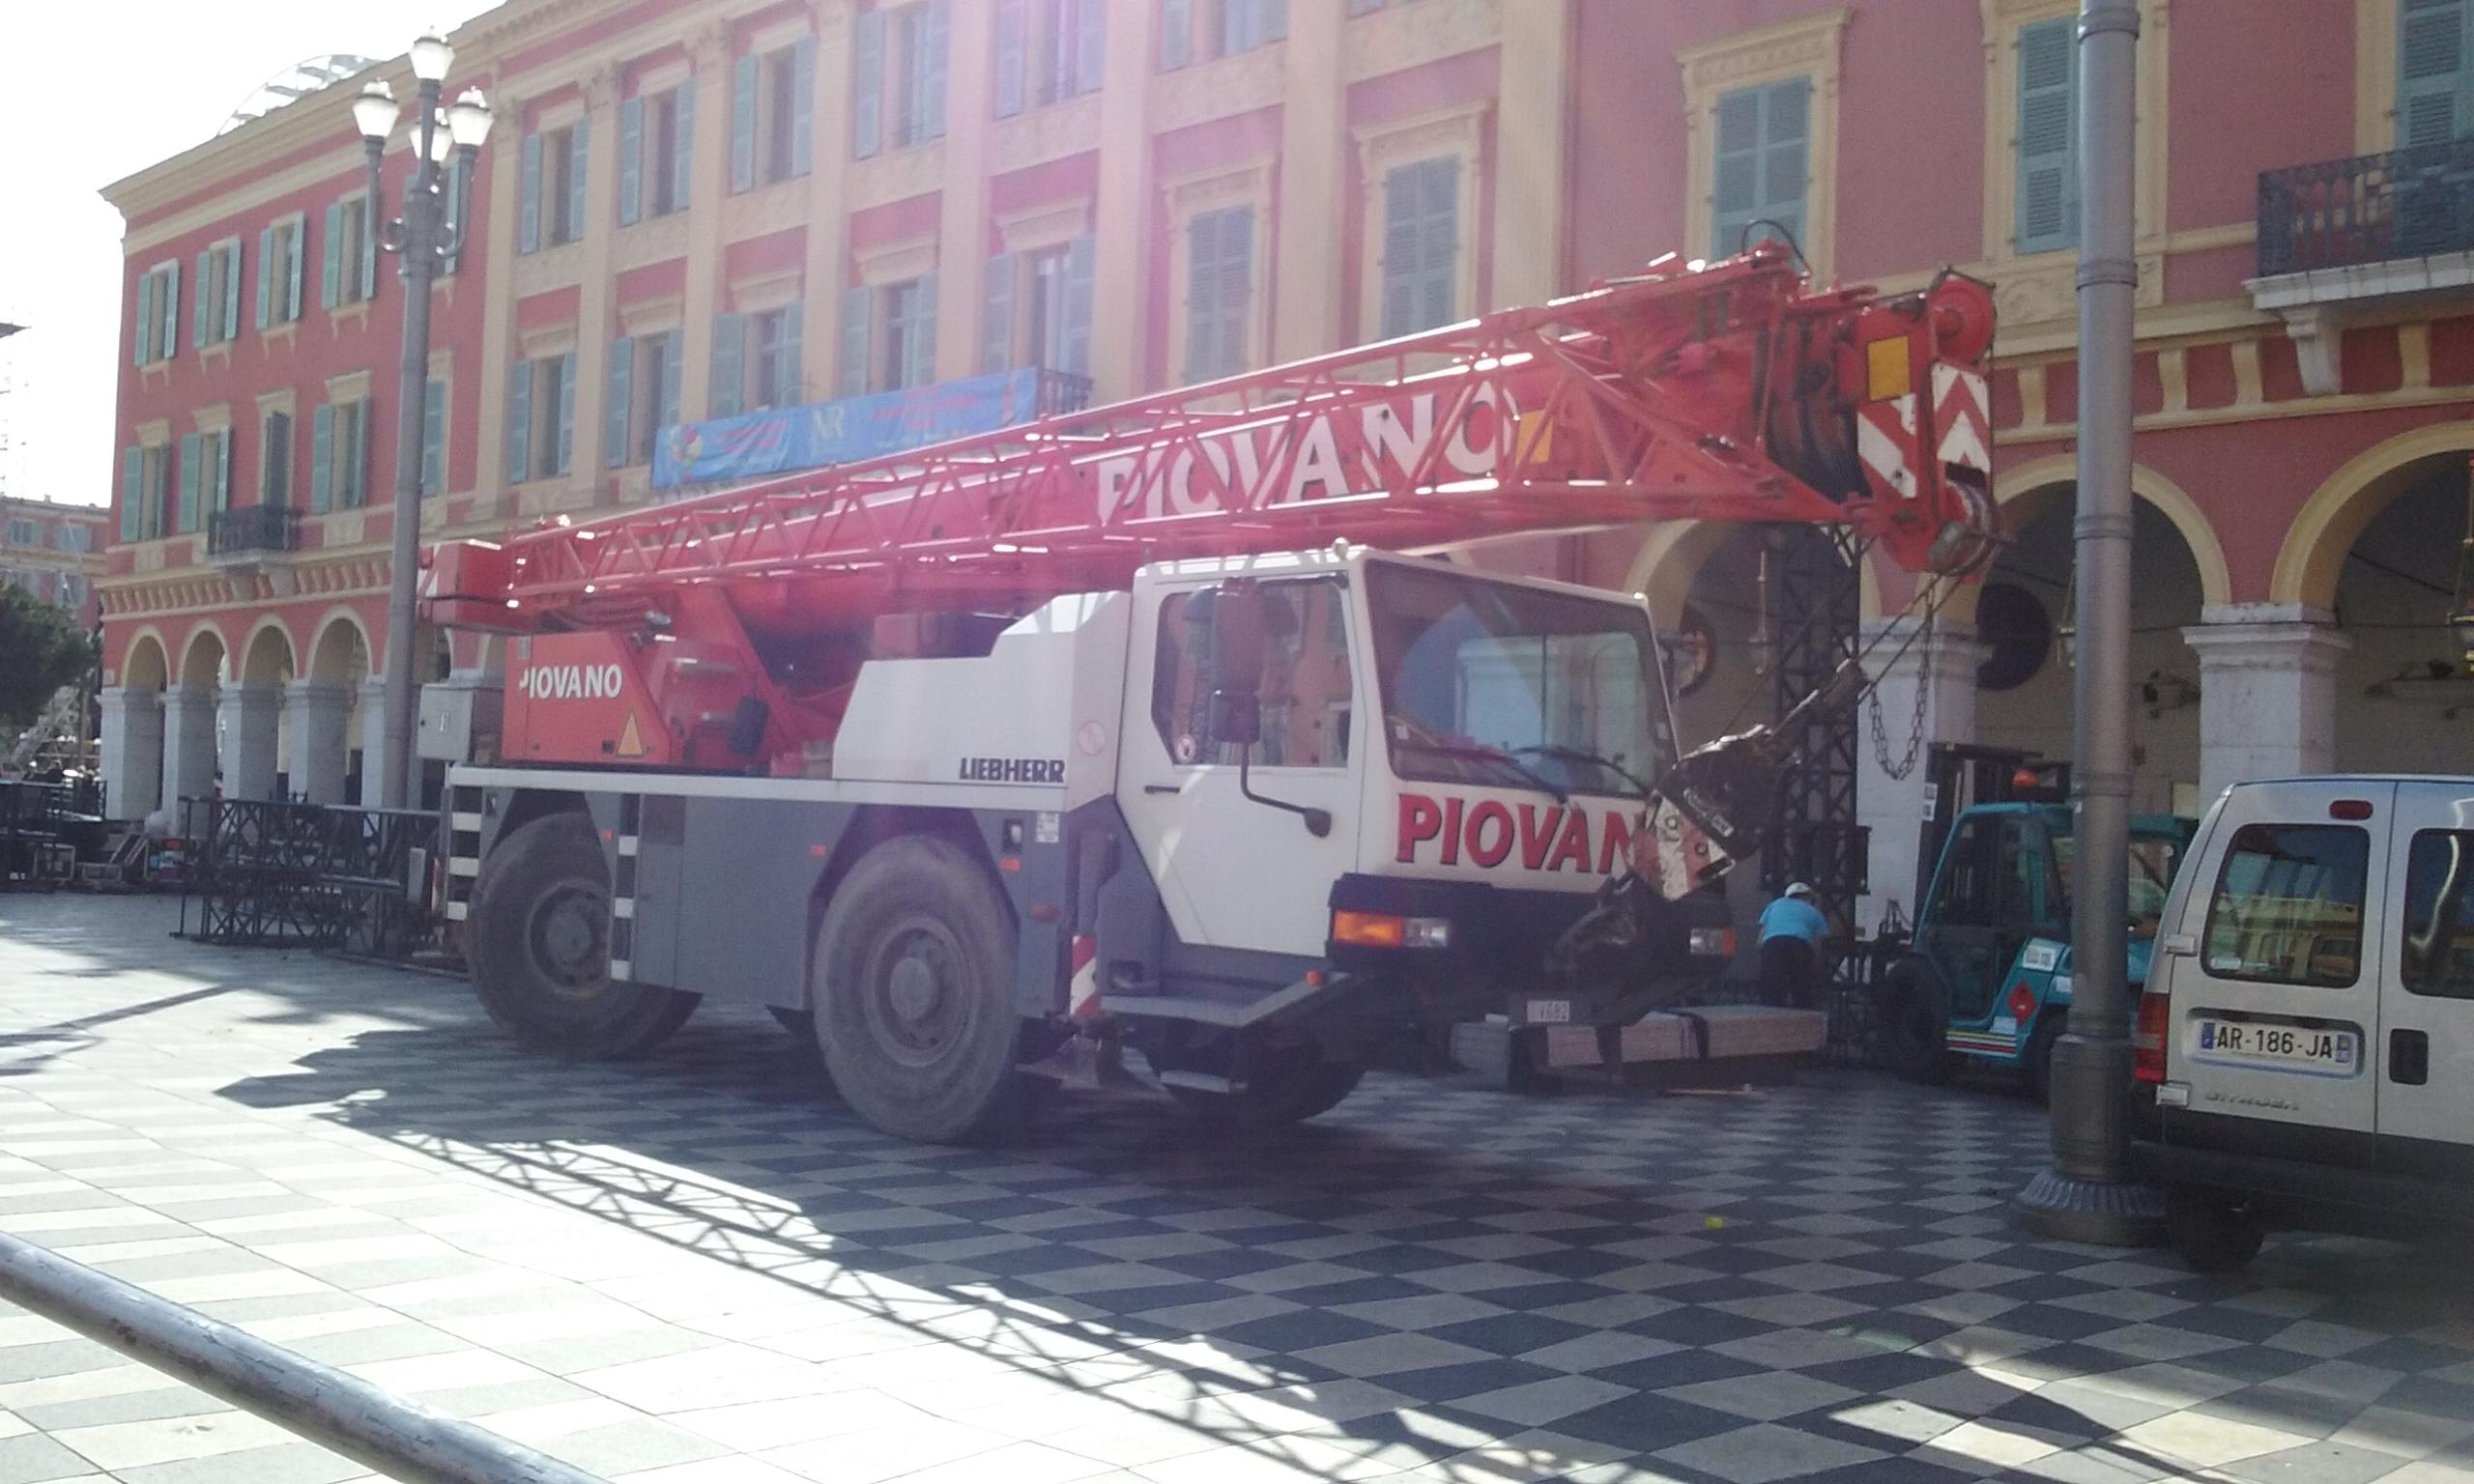 Les Grues de PIOVANO (France & Italie) 16063720160302132804